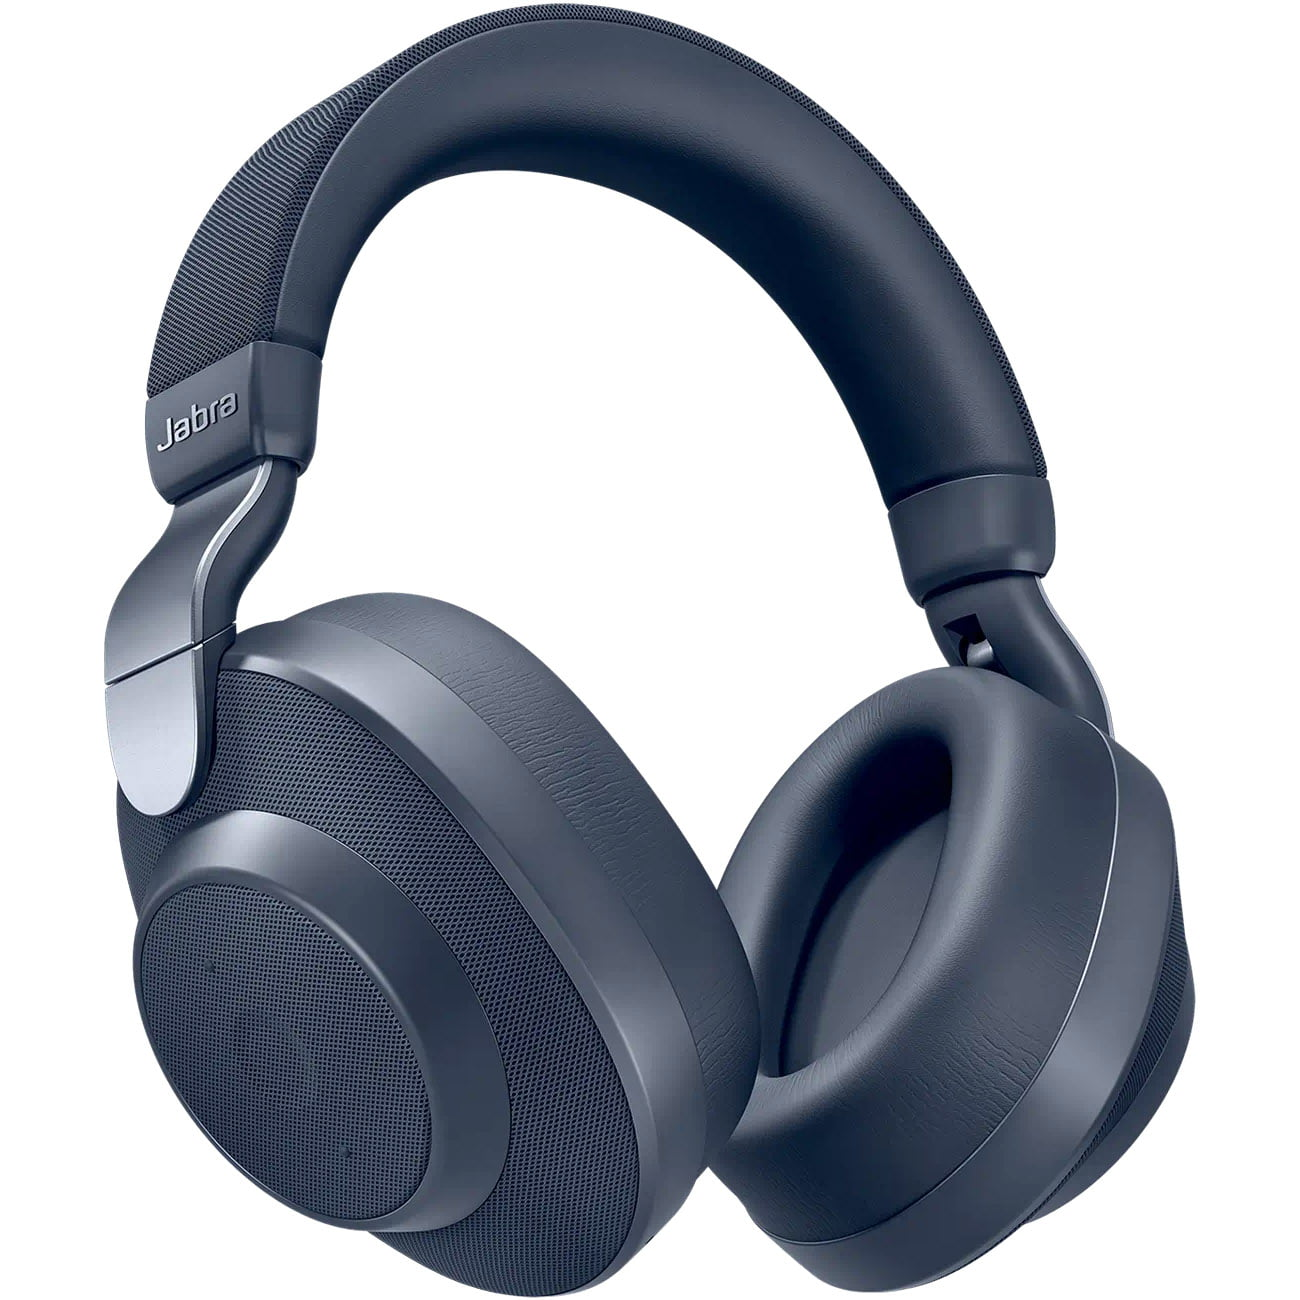 Casti bluetooth Jabra Elite 85h, Over-Ear, SmartSound, ANC, Wireless, Navy Blue